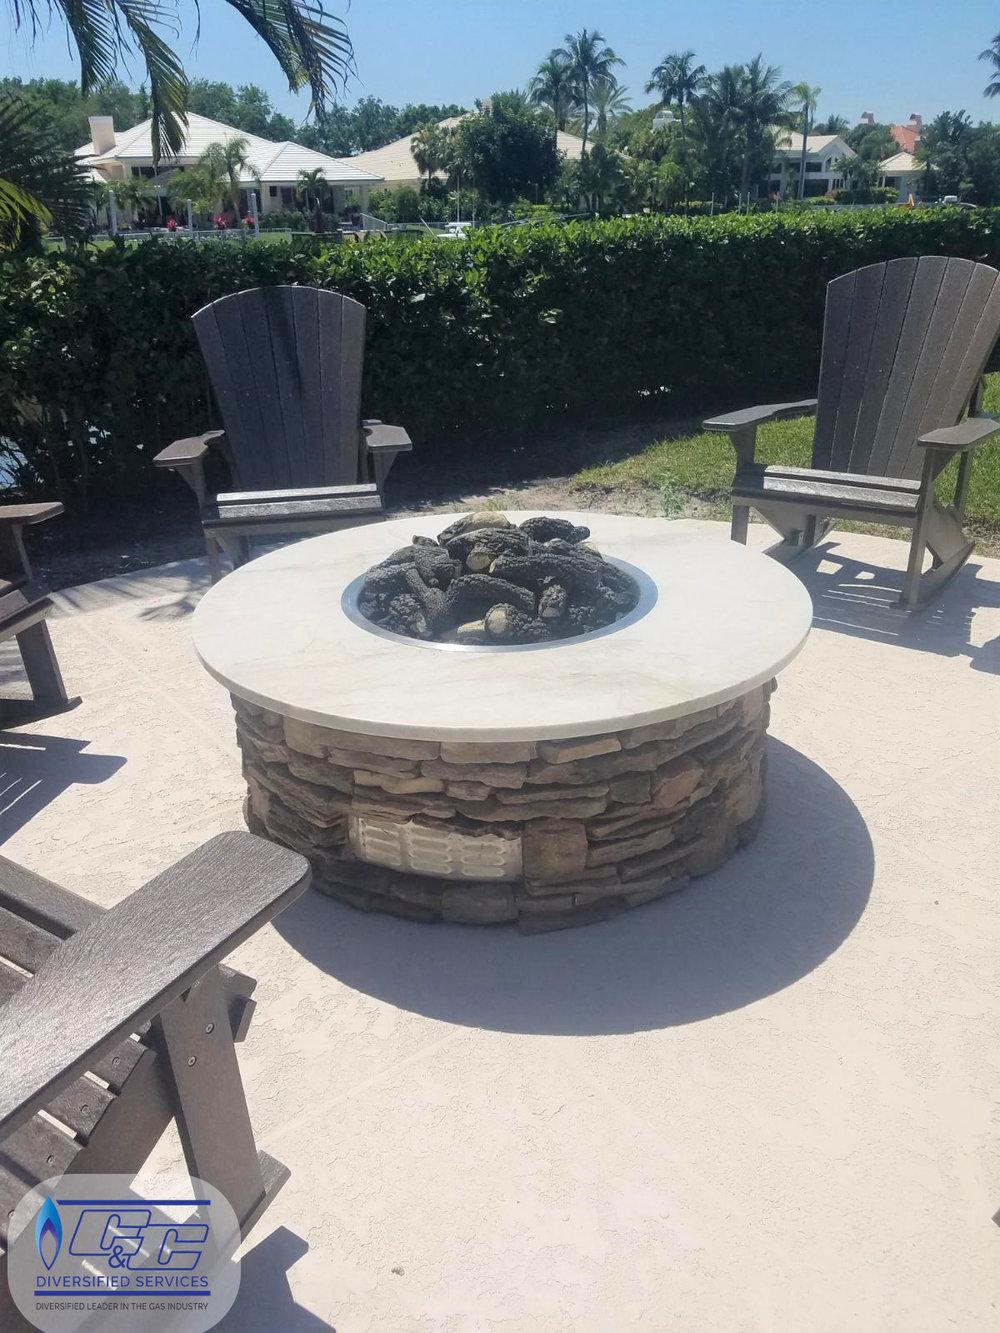 Custom round fire pit - vent louvers for proper cross ventilation